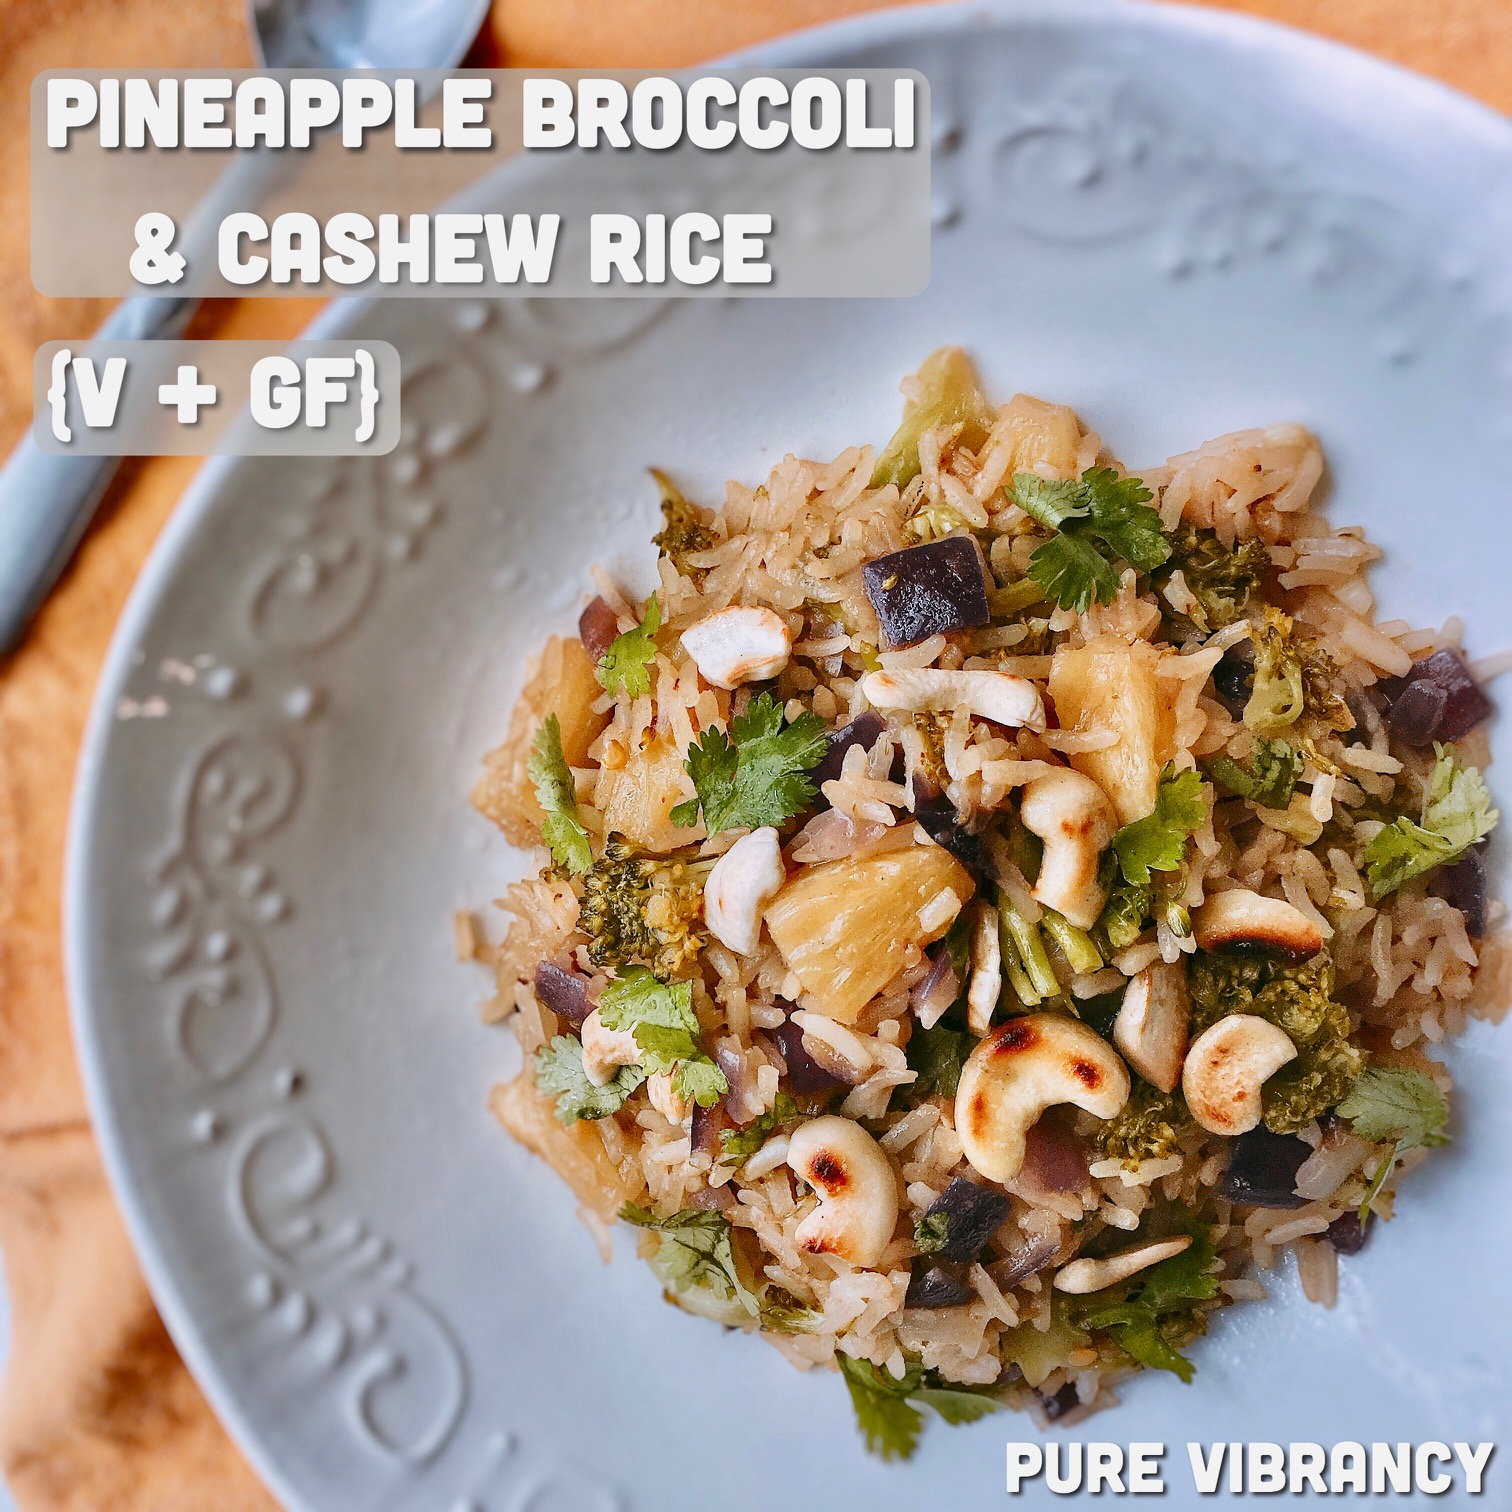 Pineapple Broccoli Cashew Rice